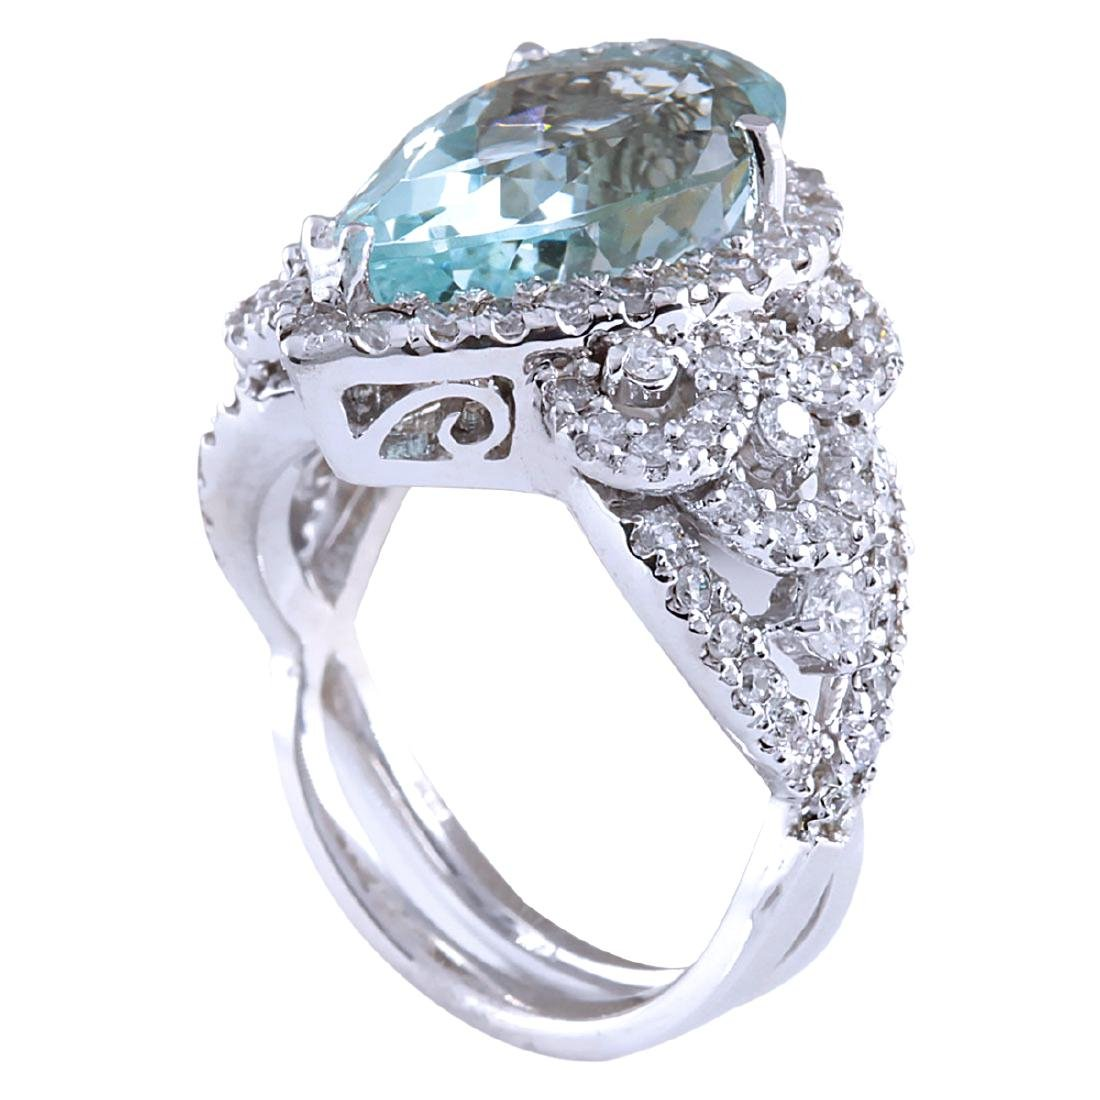 7.30CTW Natural Aquamarine And Diamond Ring In 18K - 3